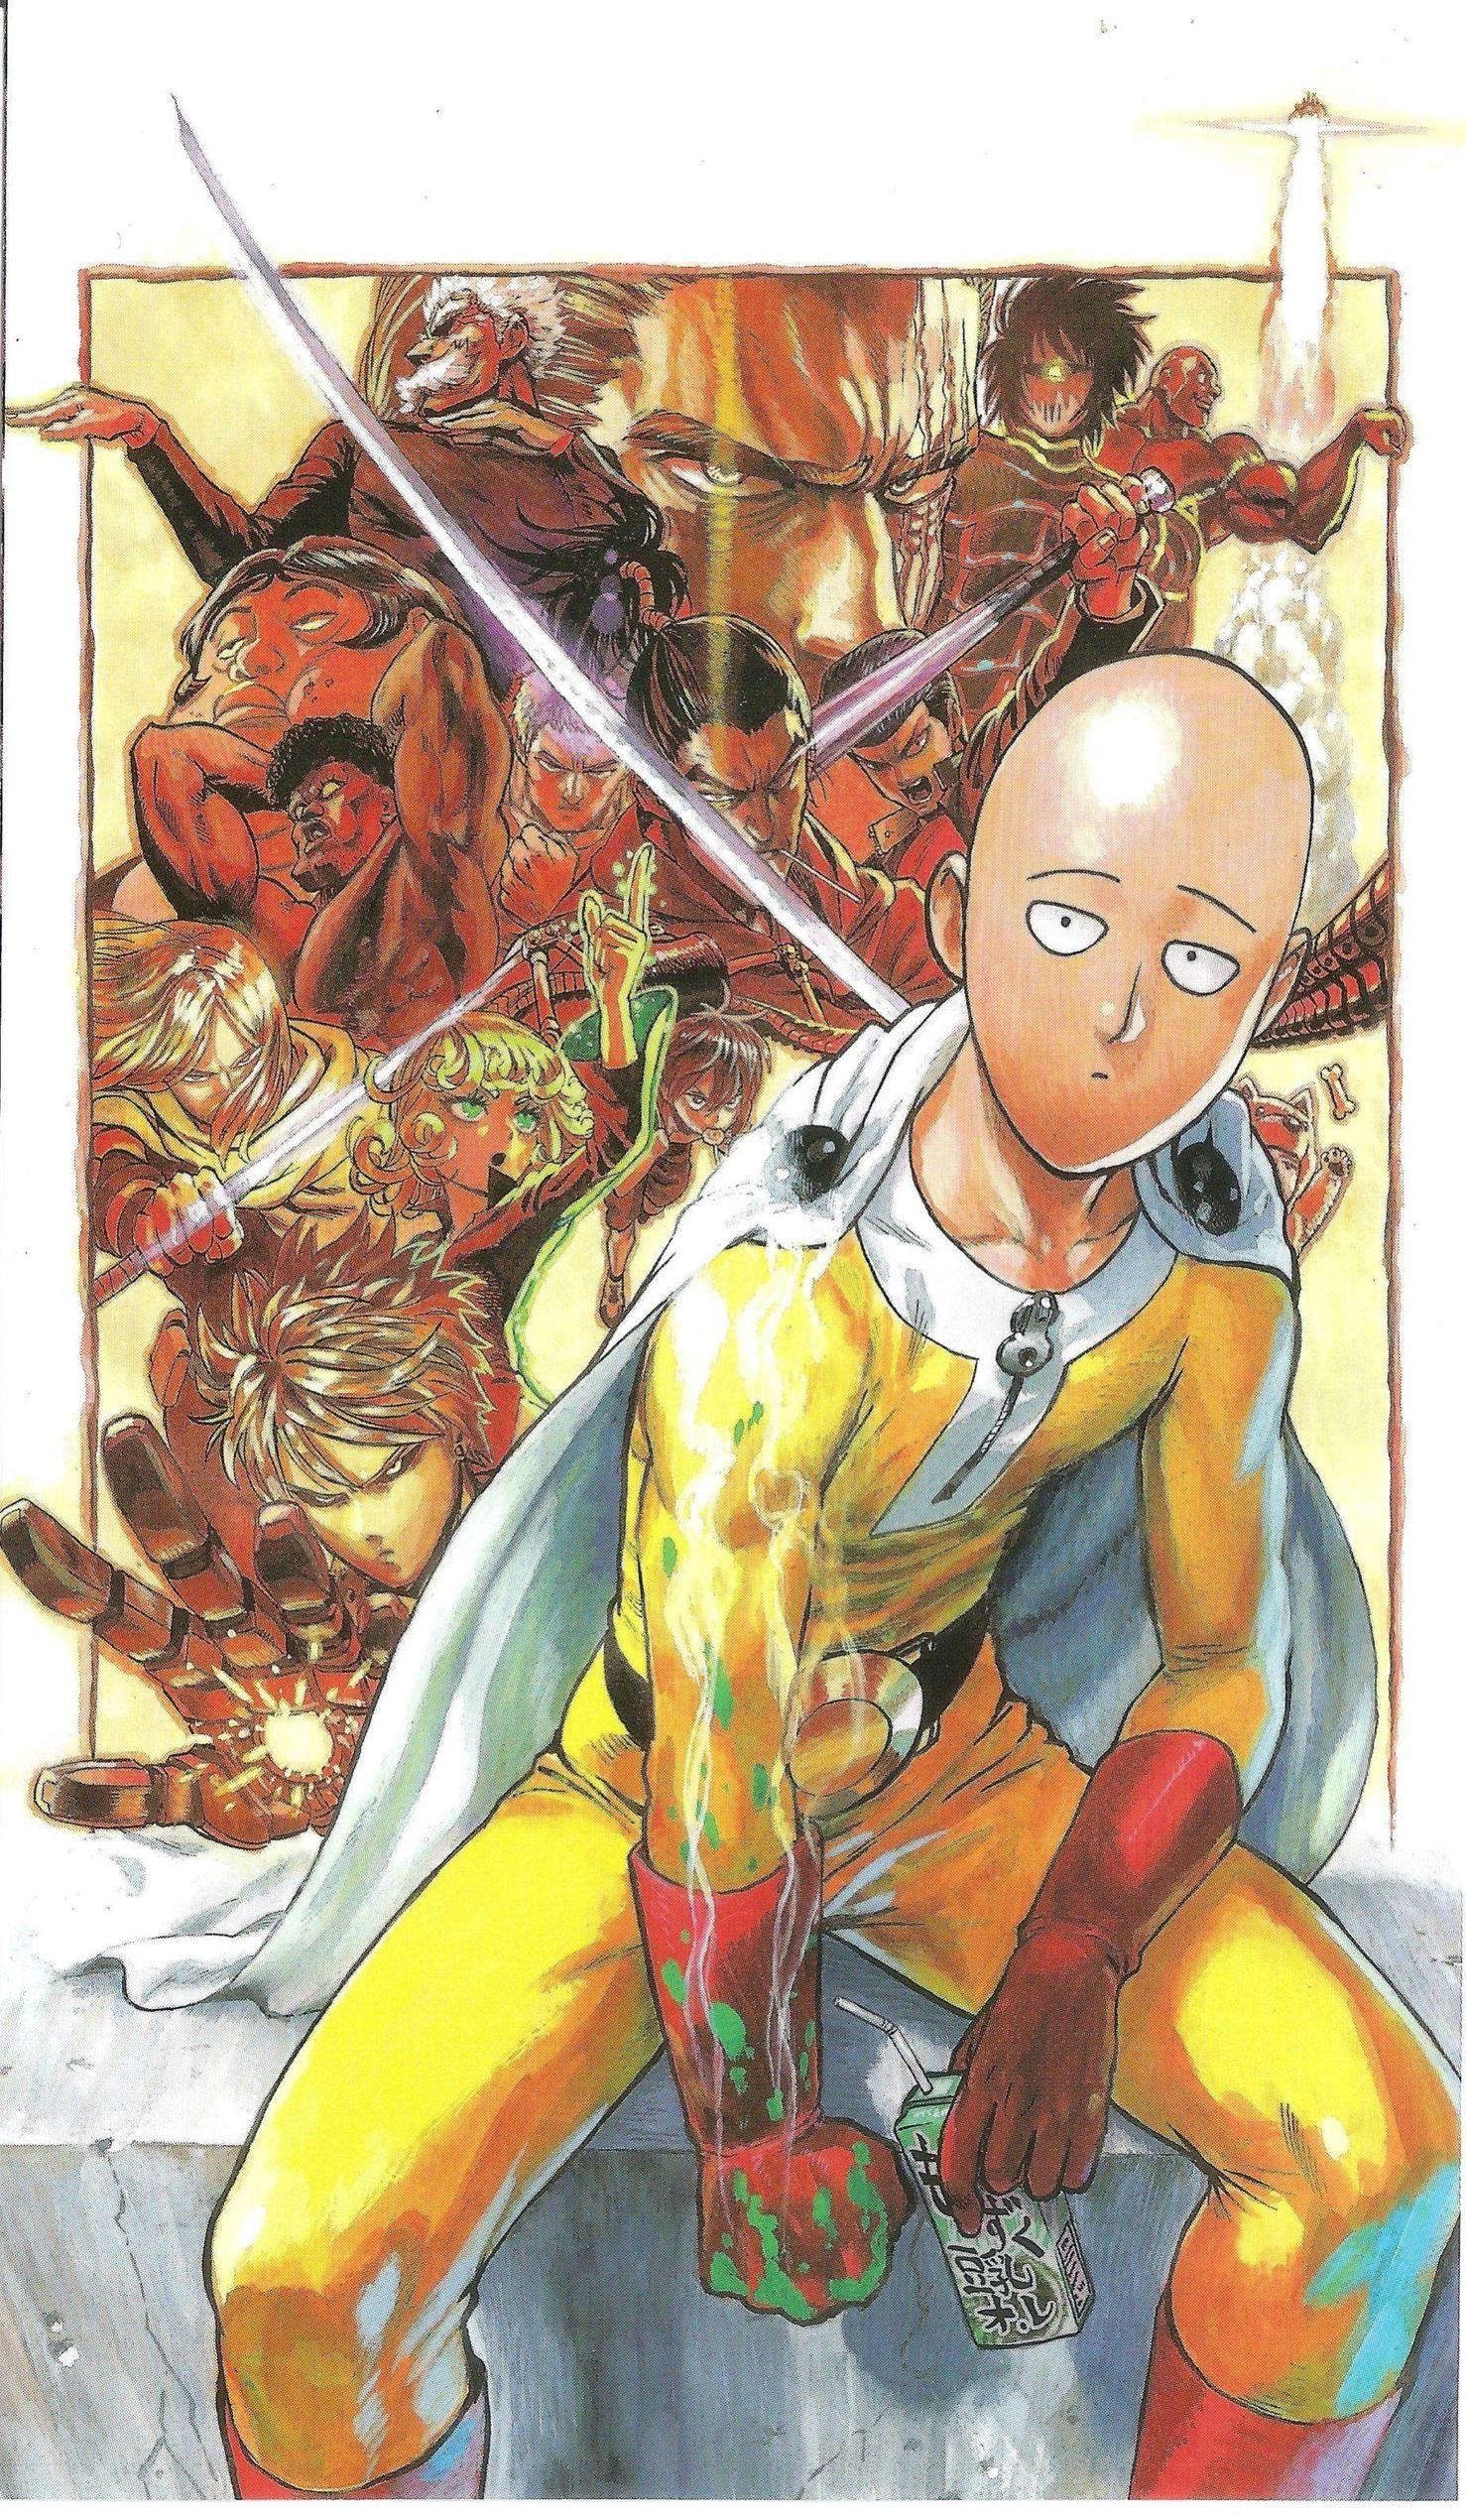 Anime 1478x2540 manga Saitama One-Punch Man